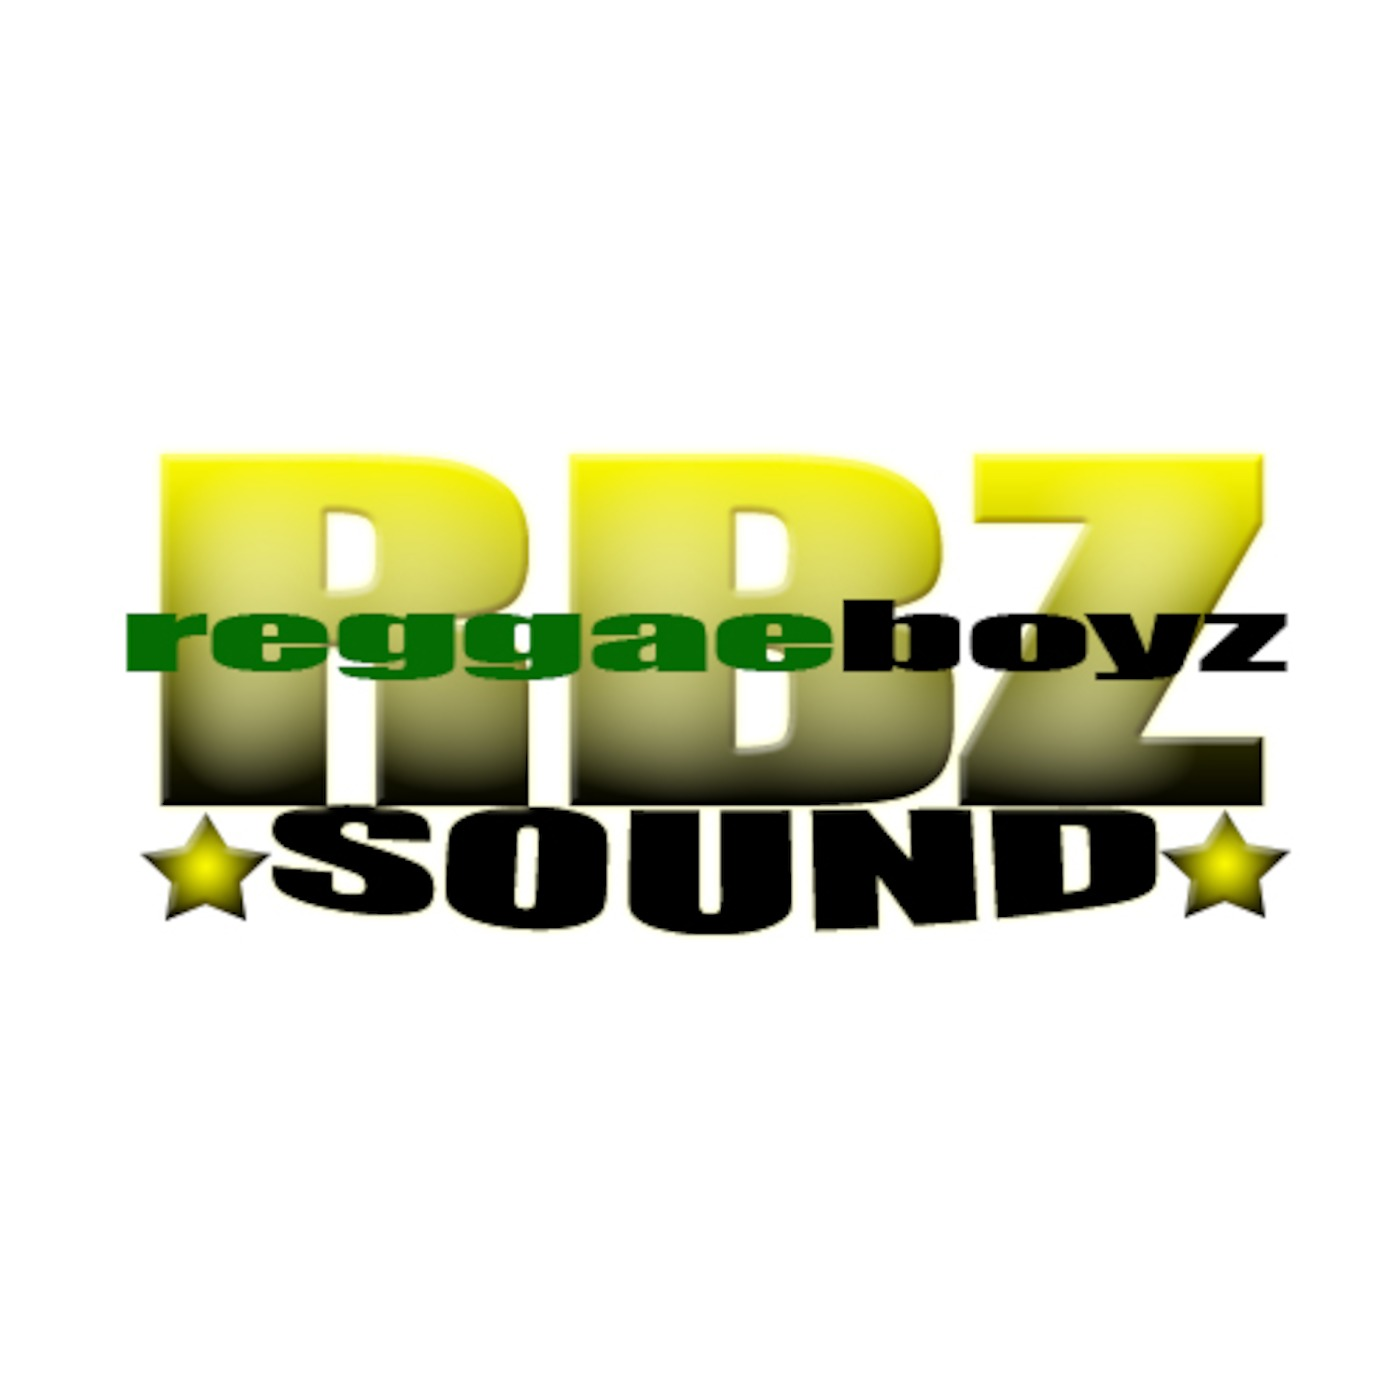 THE JOINT LABOR DAY MIX ON SIRIUSXM REGGAEBOYZ SOUND podcast